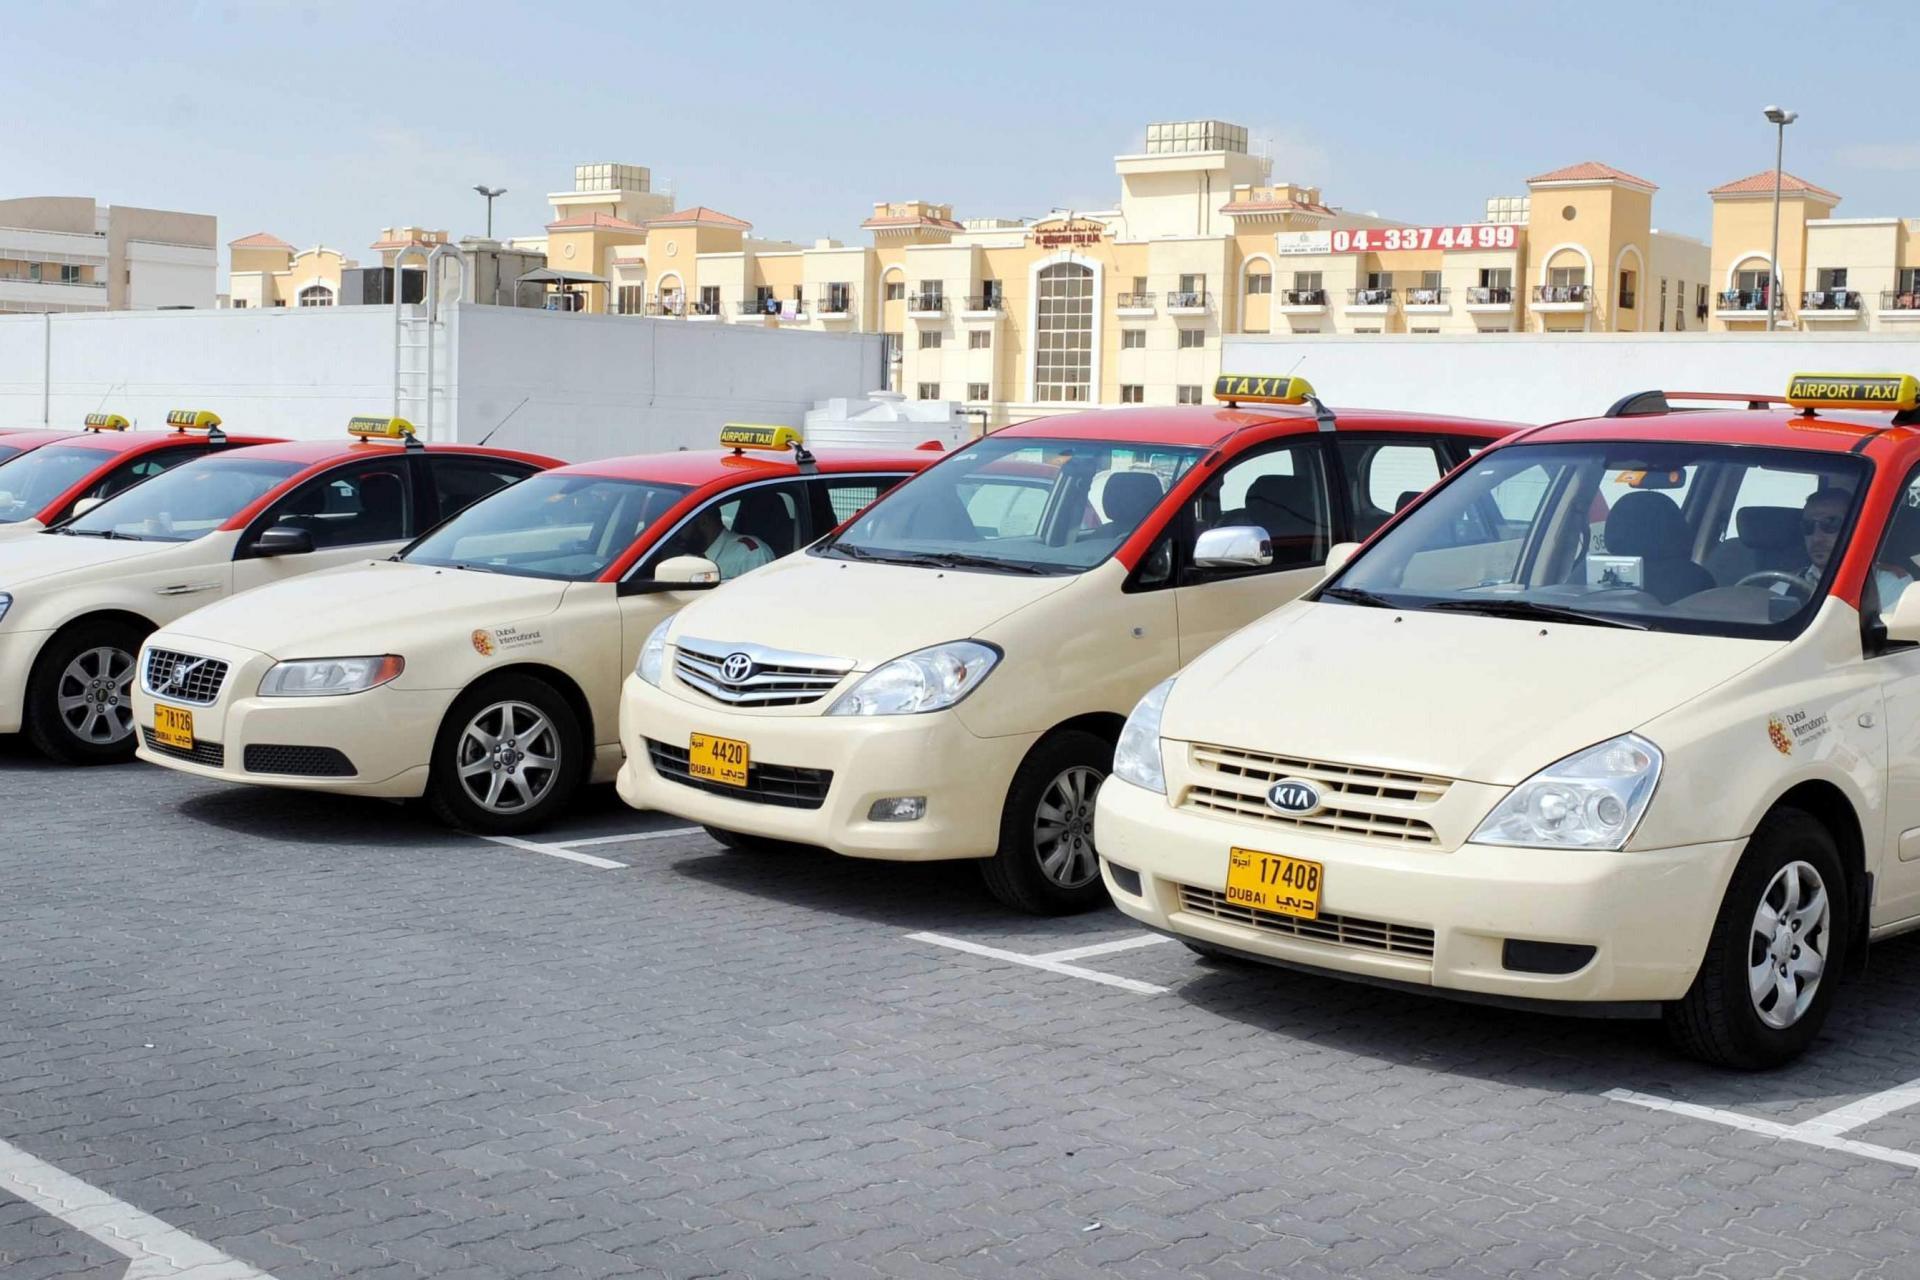 Преимущества коллективного такси